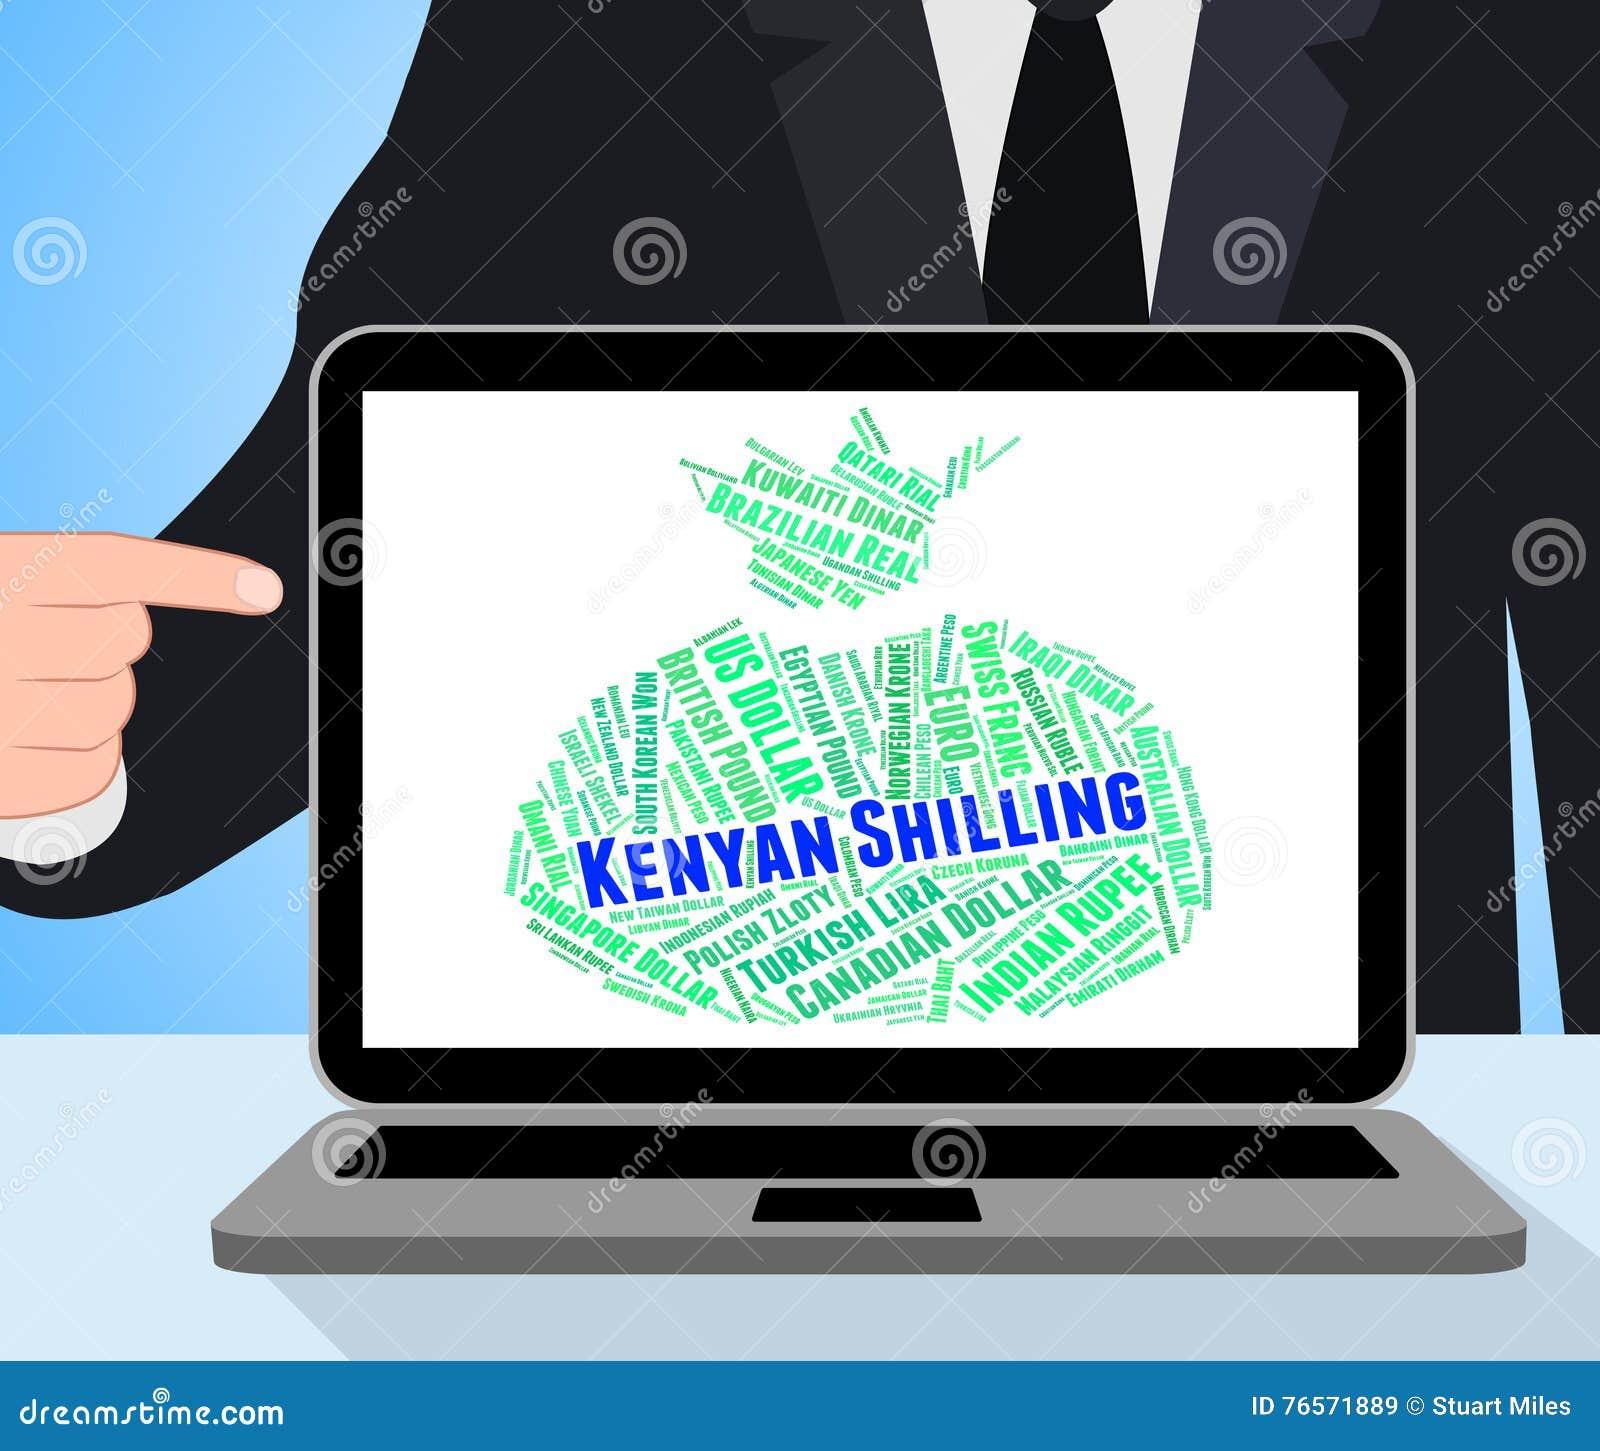 Kenyan Shilling Represents Foreign Currency y billete de banco